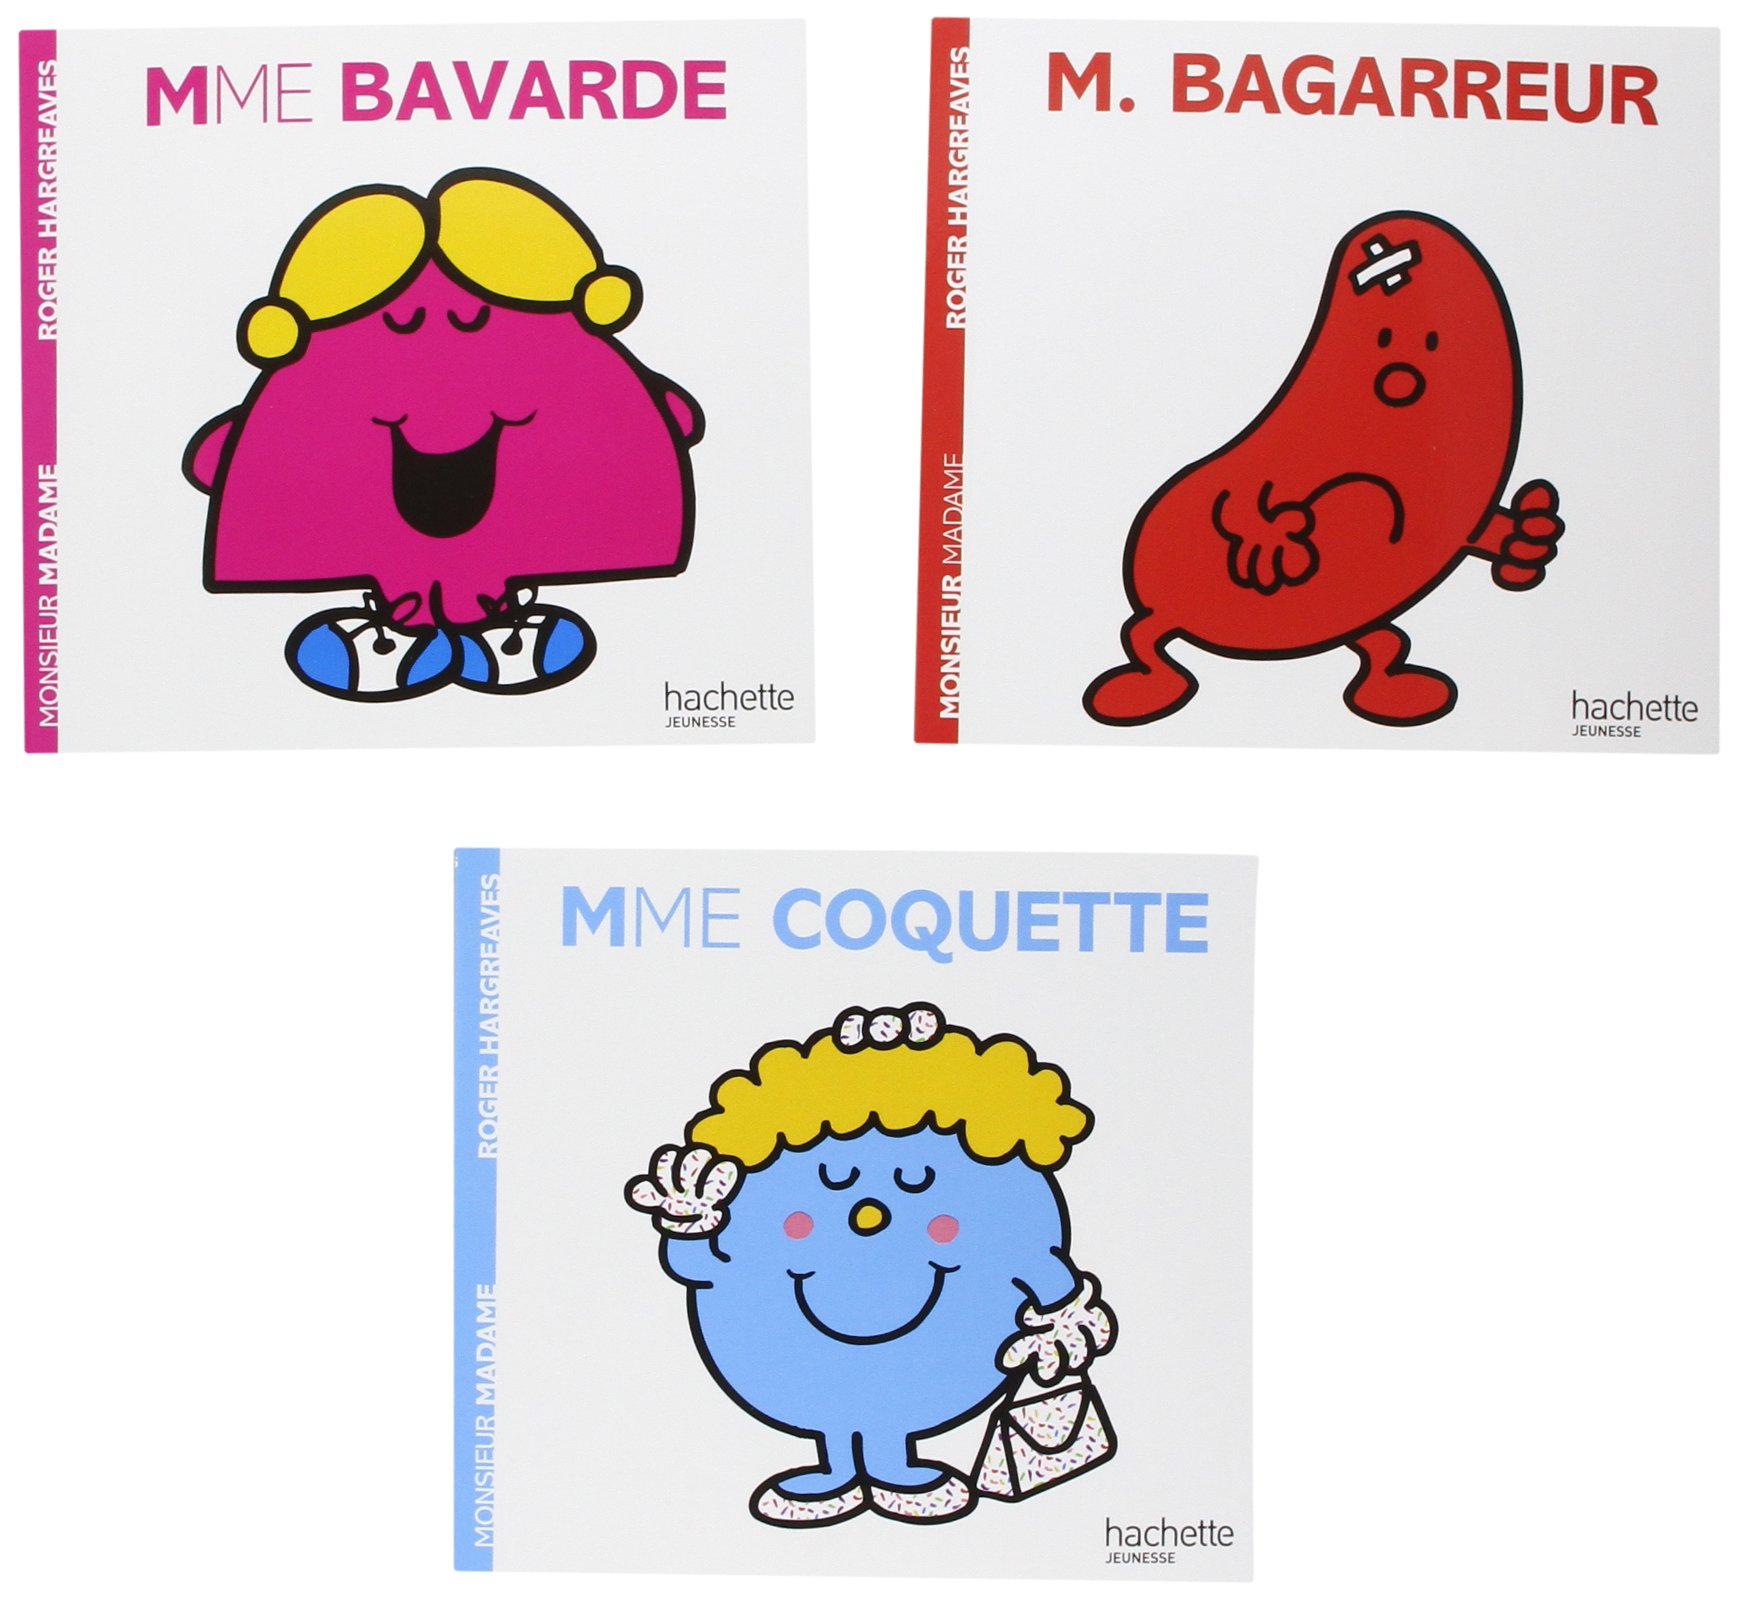 Mon Coffret Monsieur Madame Amazon Ca Collectif Books